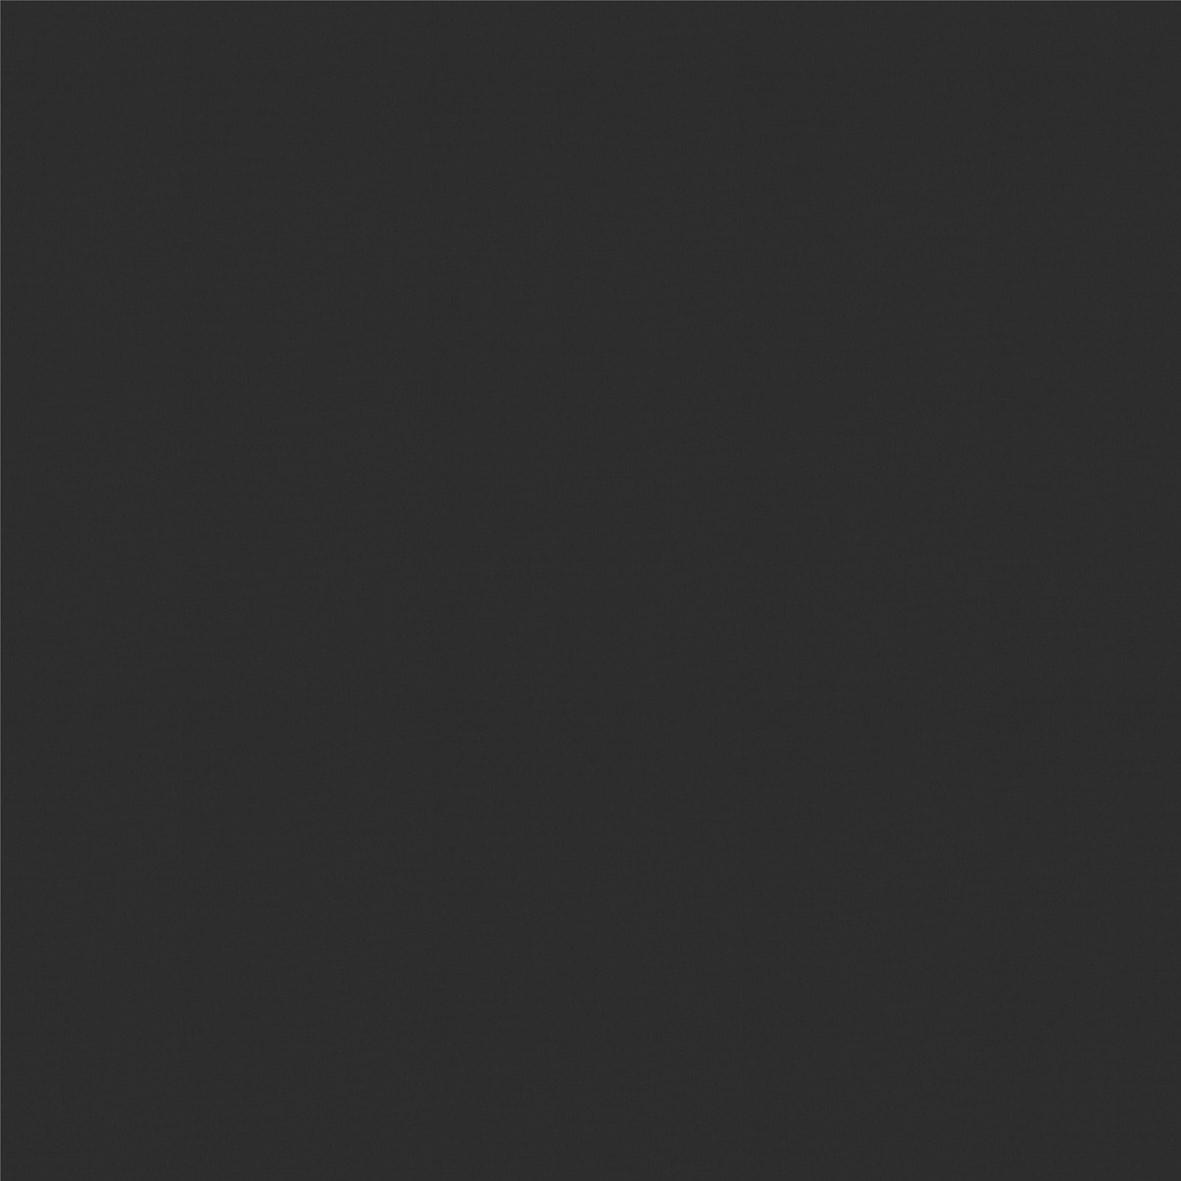 Roller_Swatch_Palette_Black_RE0022